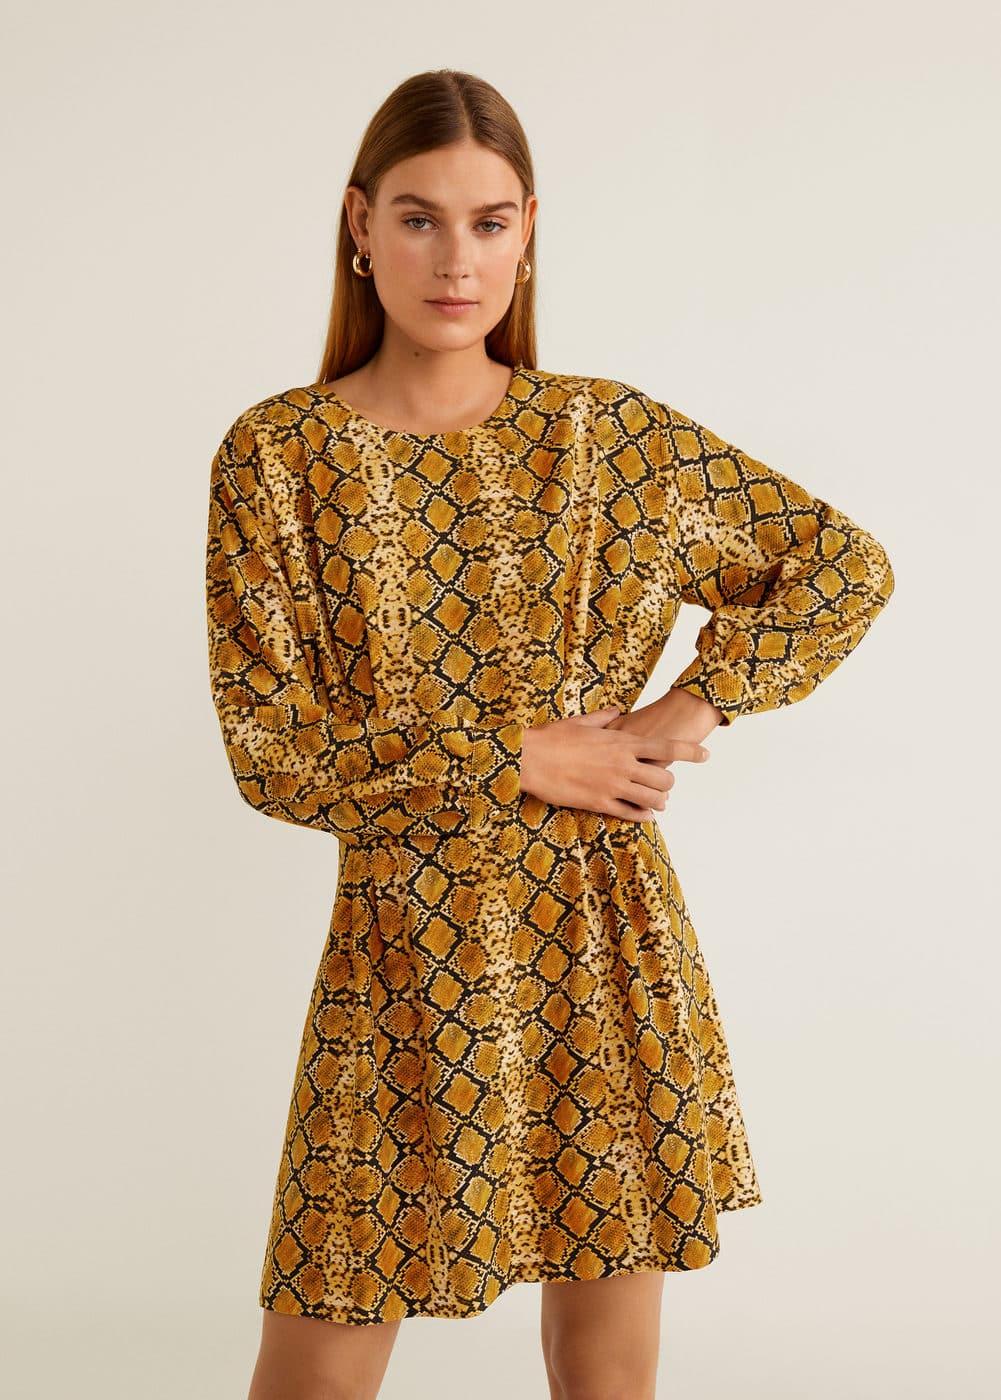 353ee8ad7a18 Φόρεμα με τύπωμα φίδι - Γυναίκα